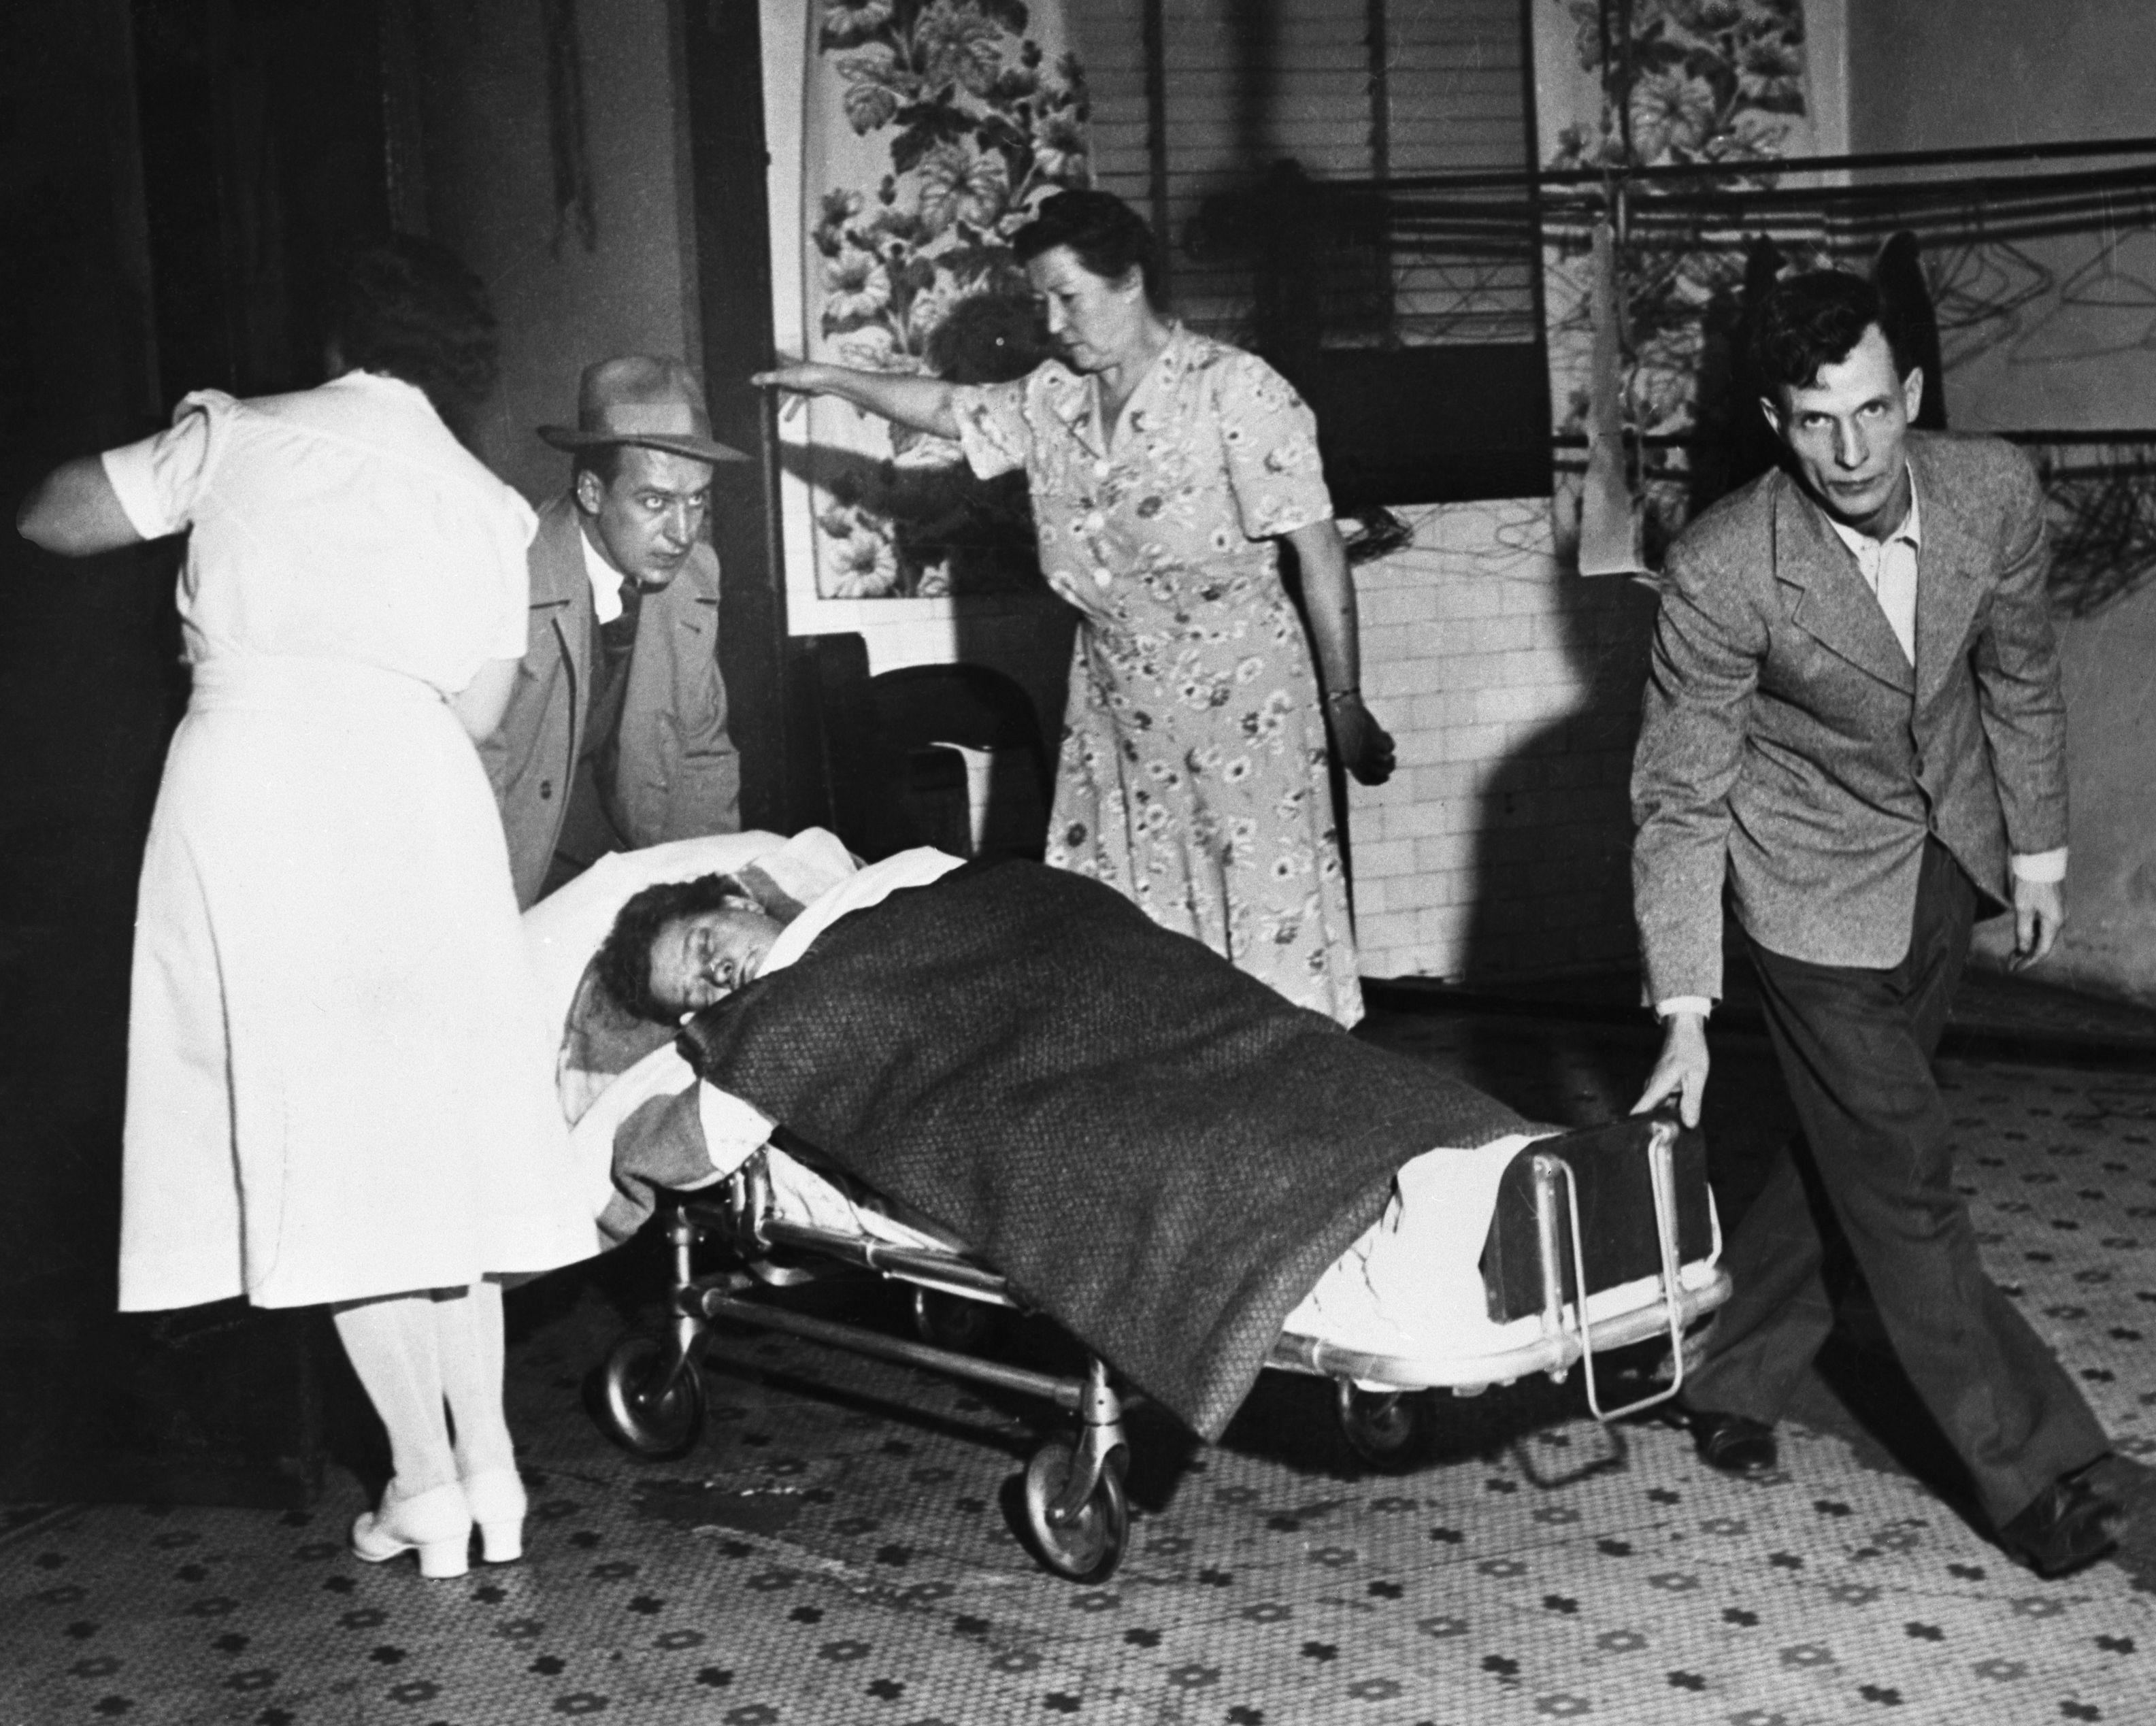 Smog victim on stretcher, Donora, PA, November 4, 1948 ...